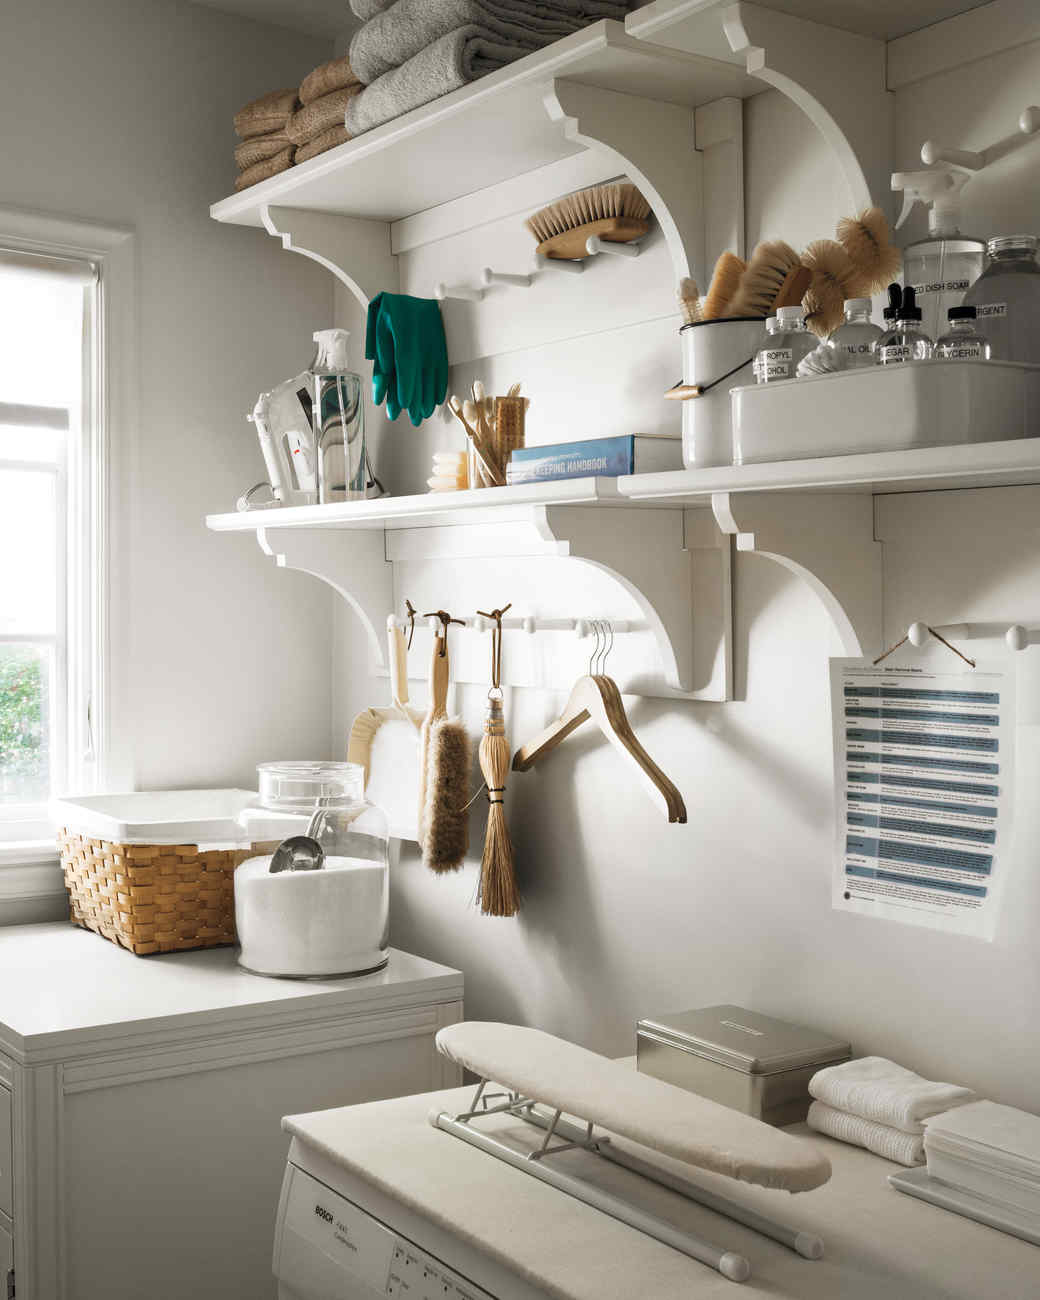 Ordinaire Marthau0027s Laundry Room Redo: Tips To Organize A Small Space | Martha Stewart